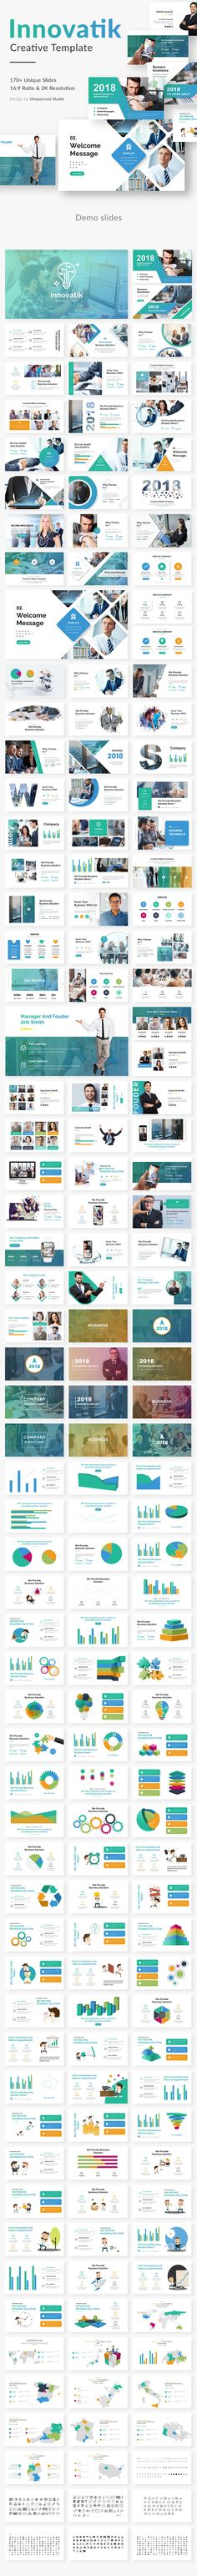 Innovatik Business #Premium #Powerpoint Template - Business PowerPoint Templates